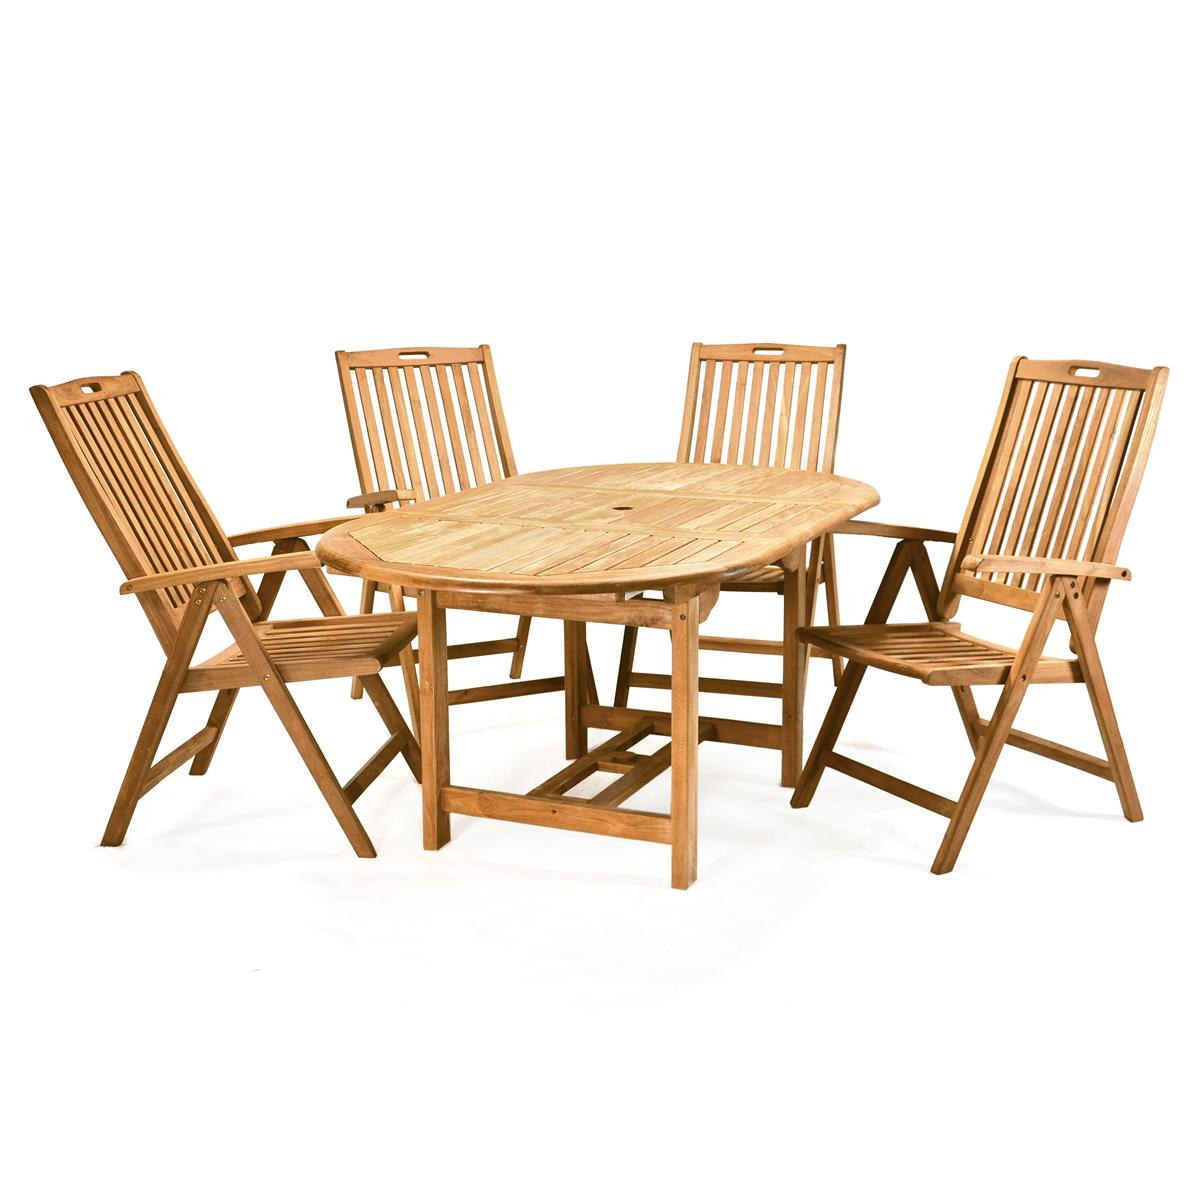 Divero Set Gartenmöbel Sitzgruppe Teakholz Behandelt Tisch